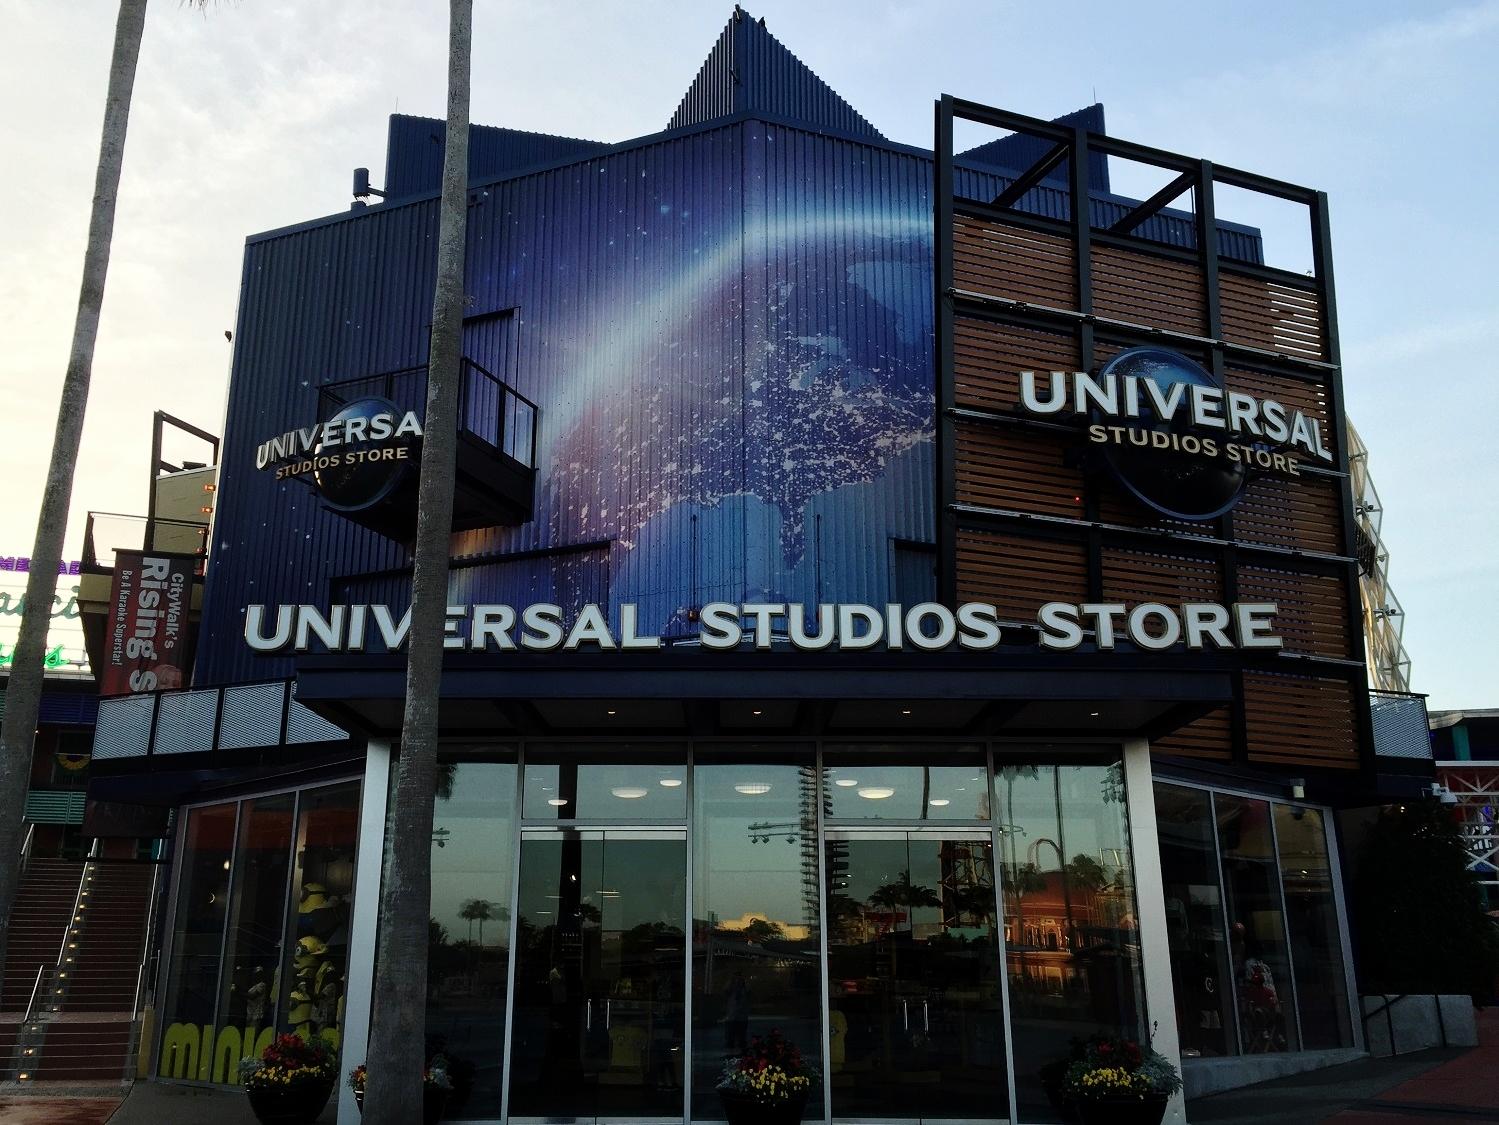 The Universal Studios Store in CtyWalk Orlando.